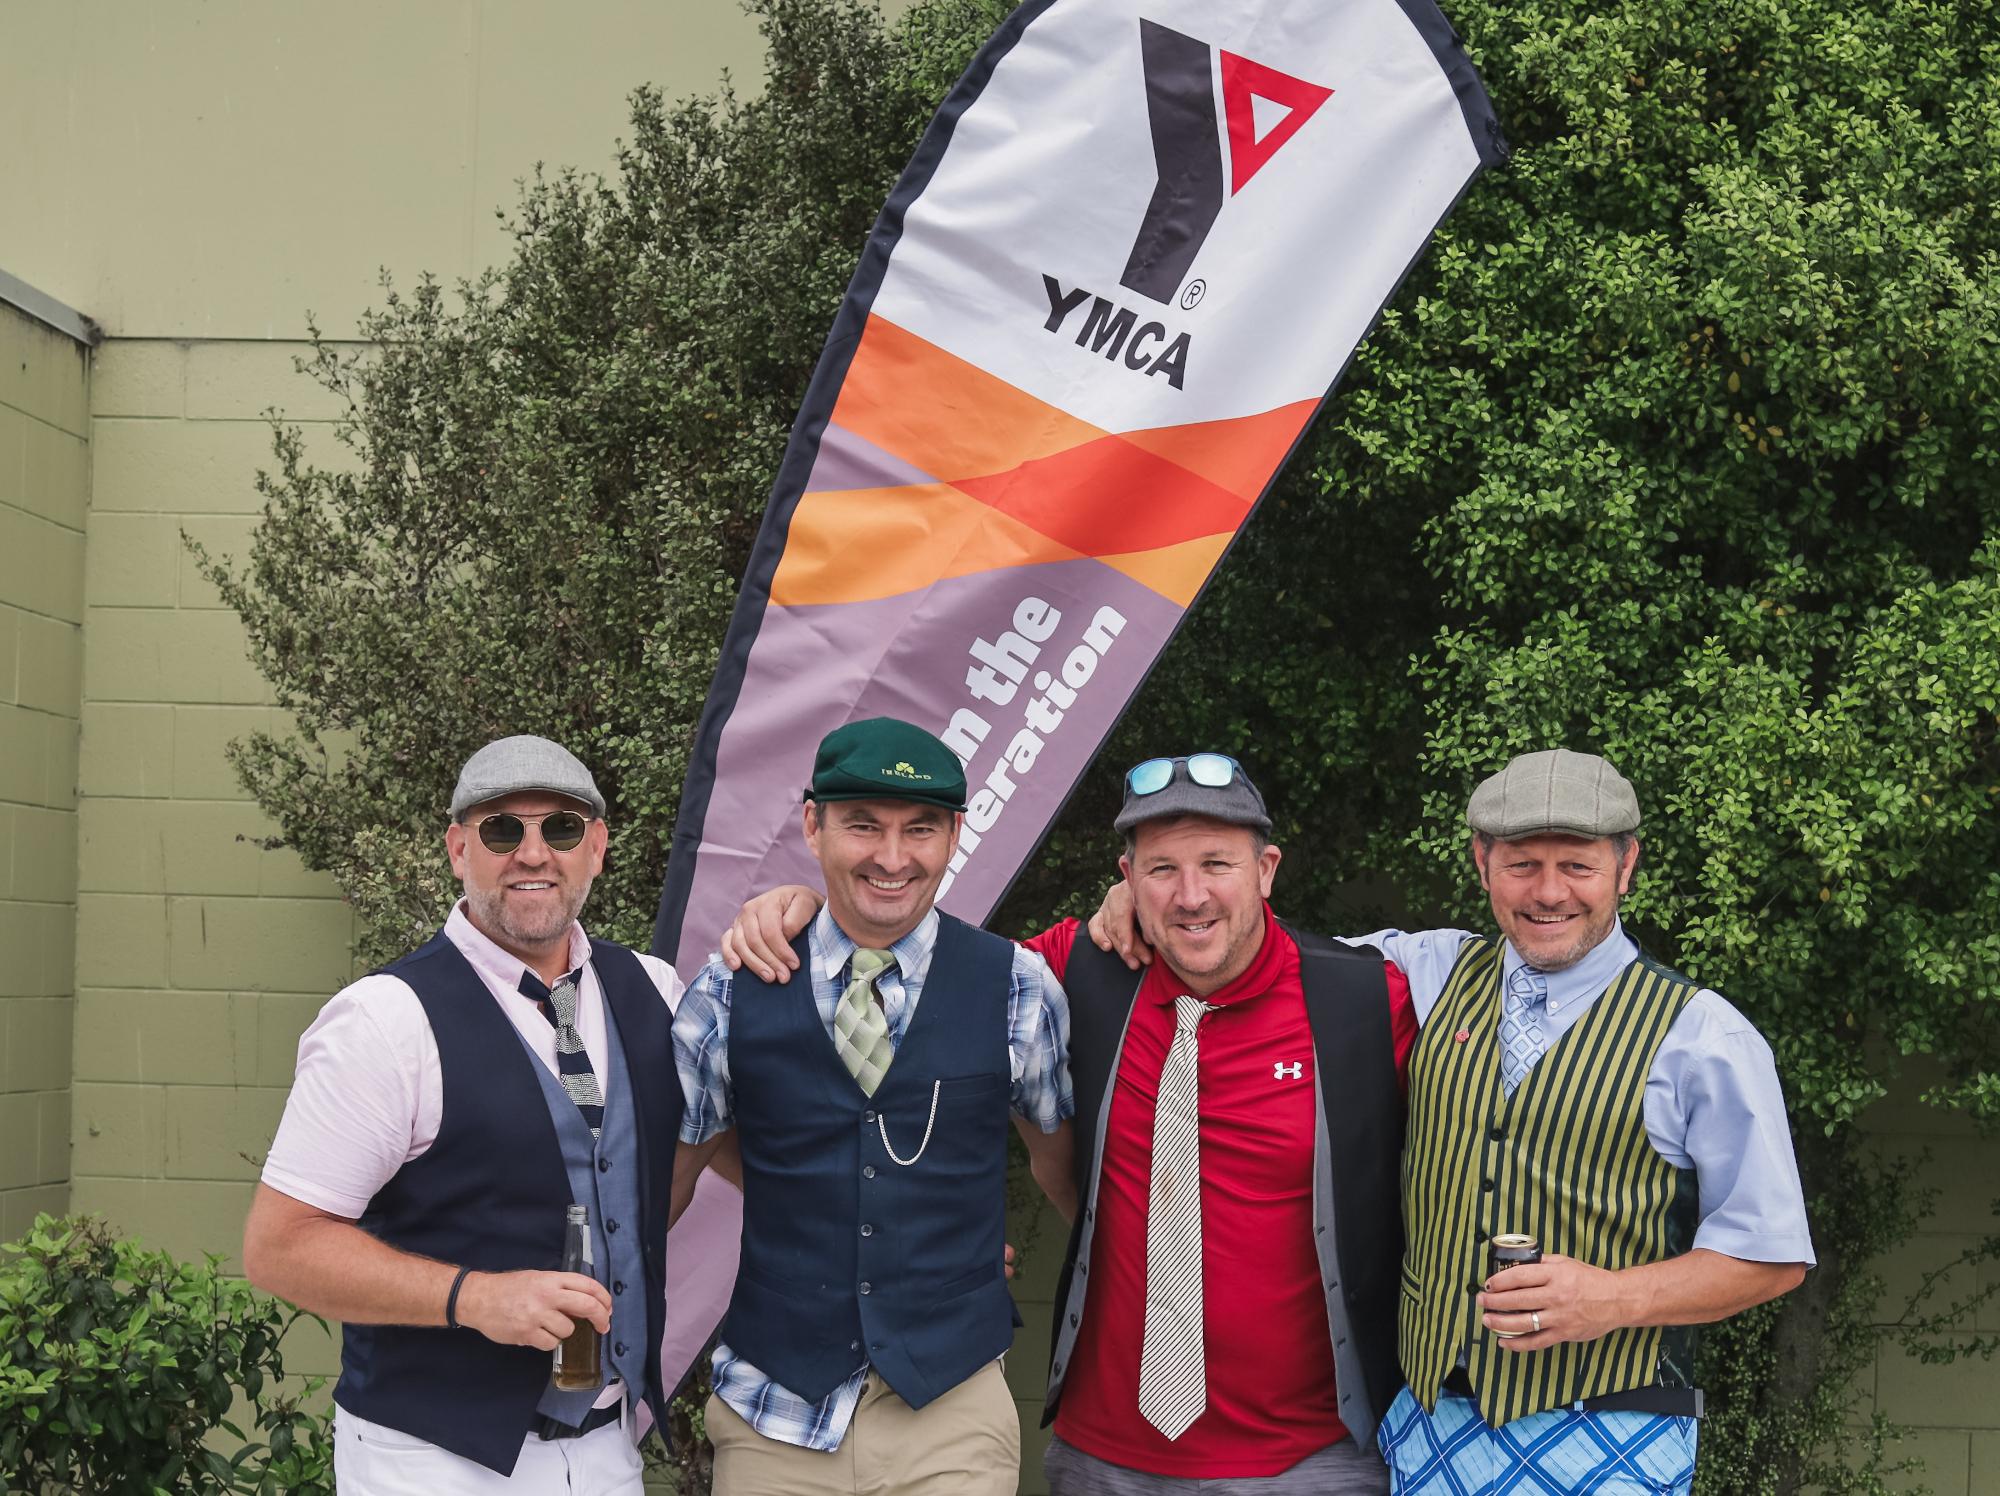 2021 YMCA Charity Golf Tournament